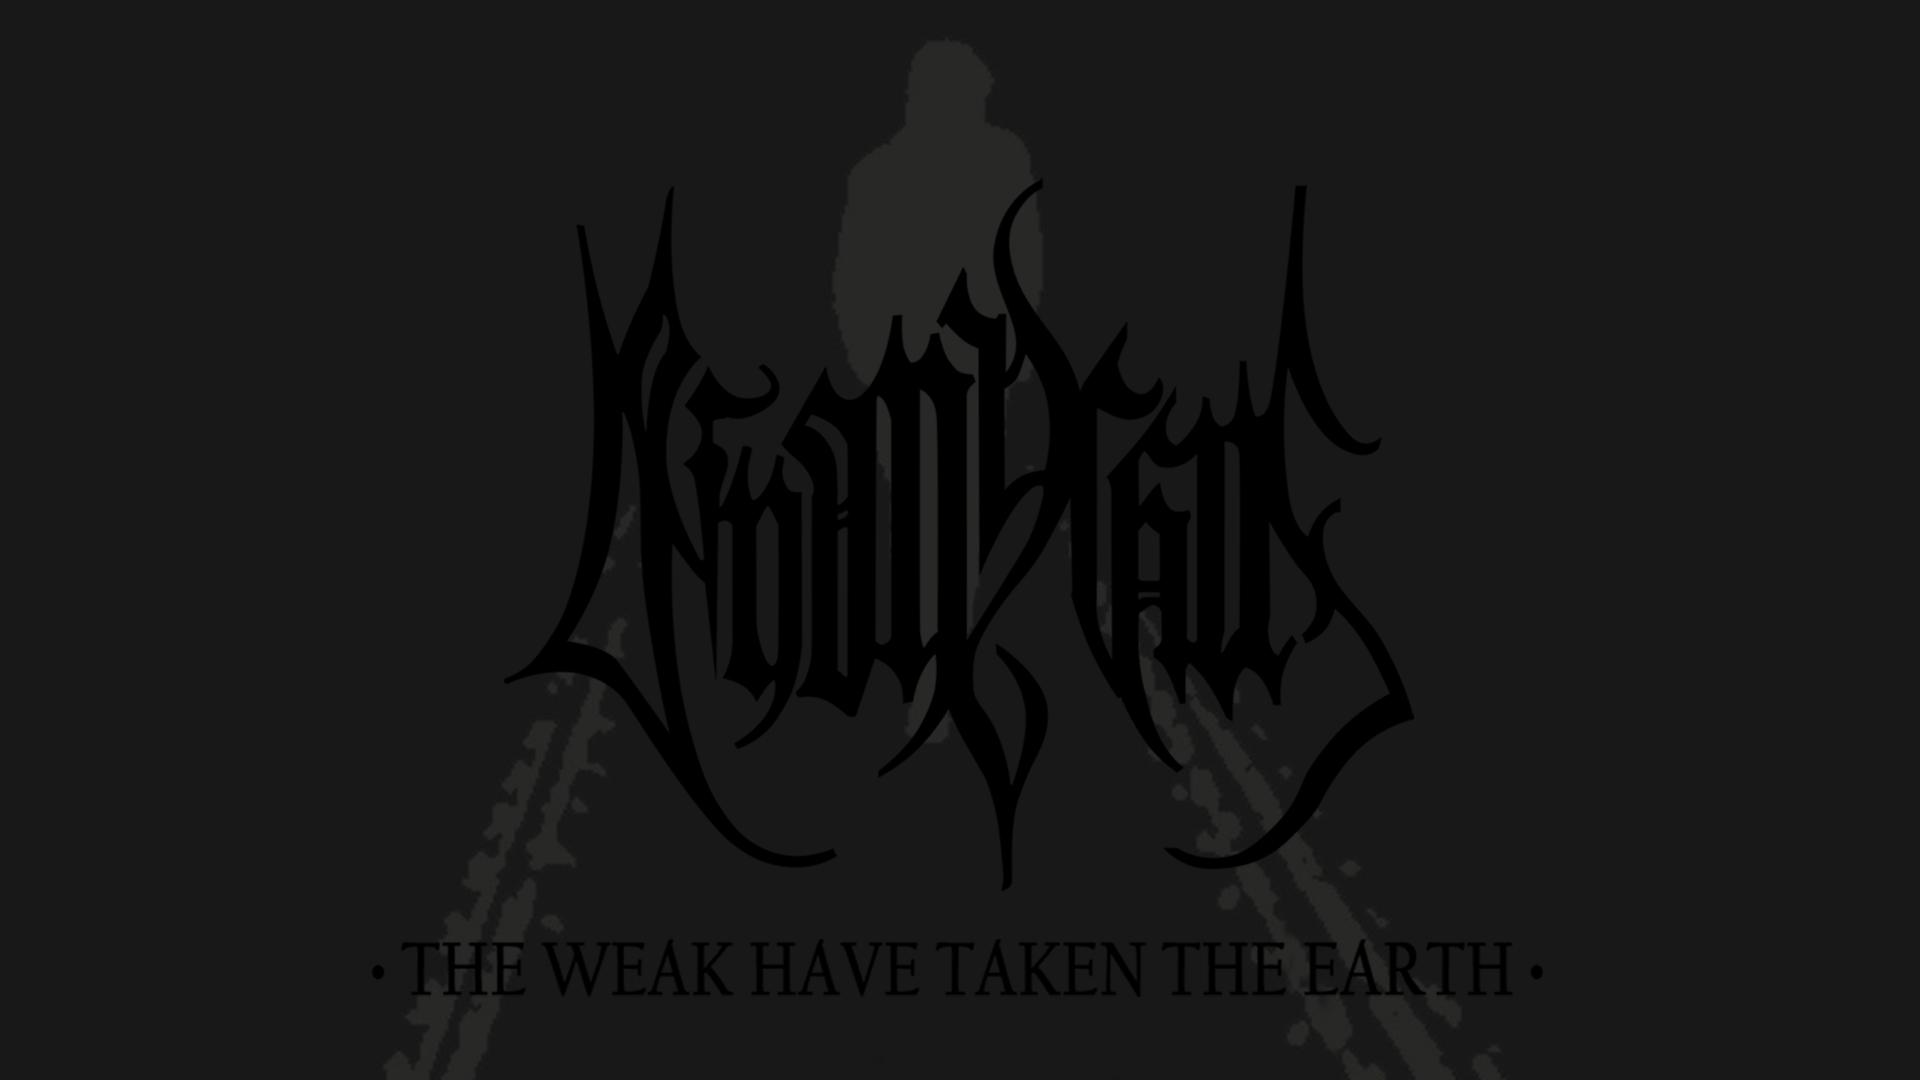 Thumbnail - The Weak